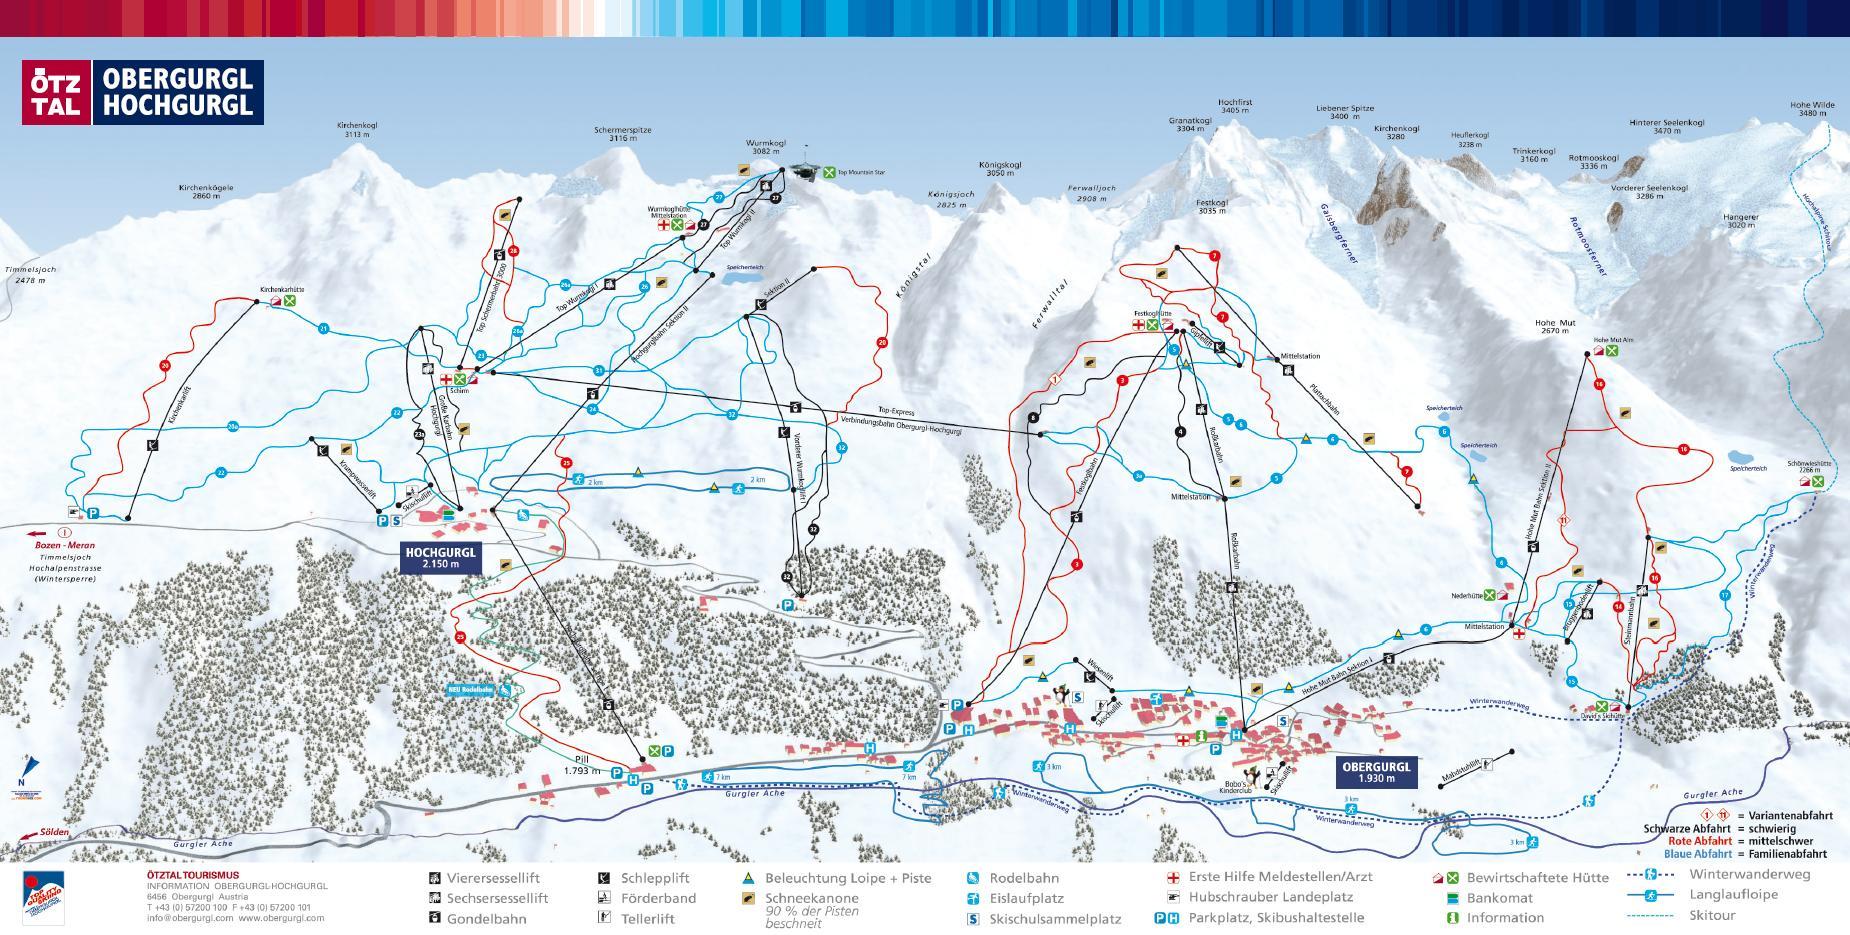 tabara de schi austria, obergurgl_himalya adventure